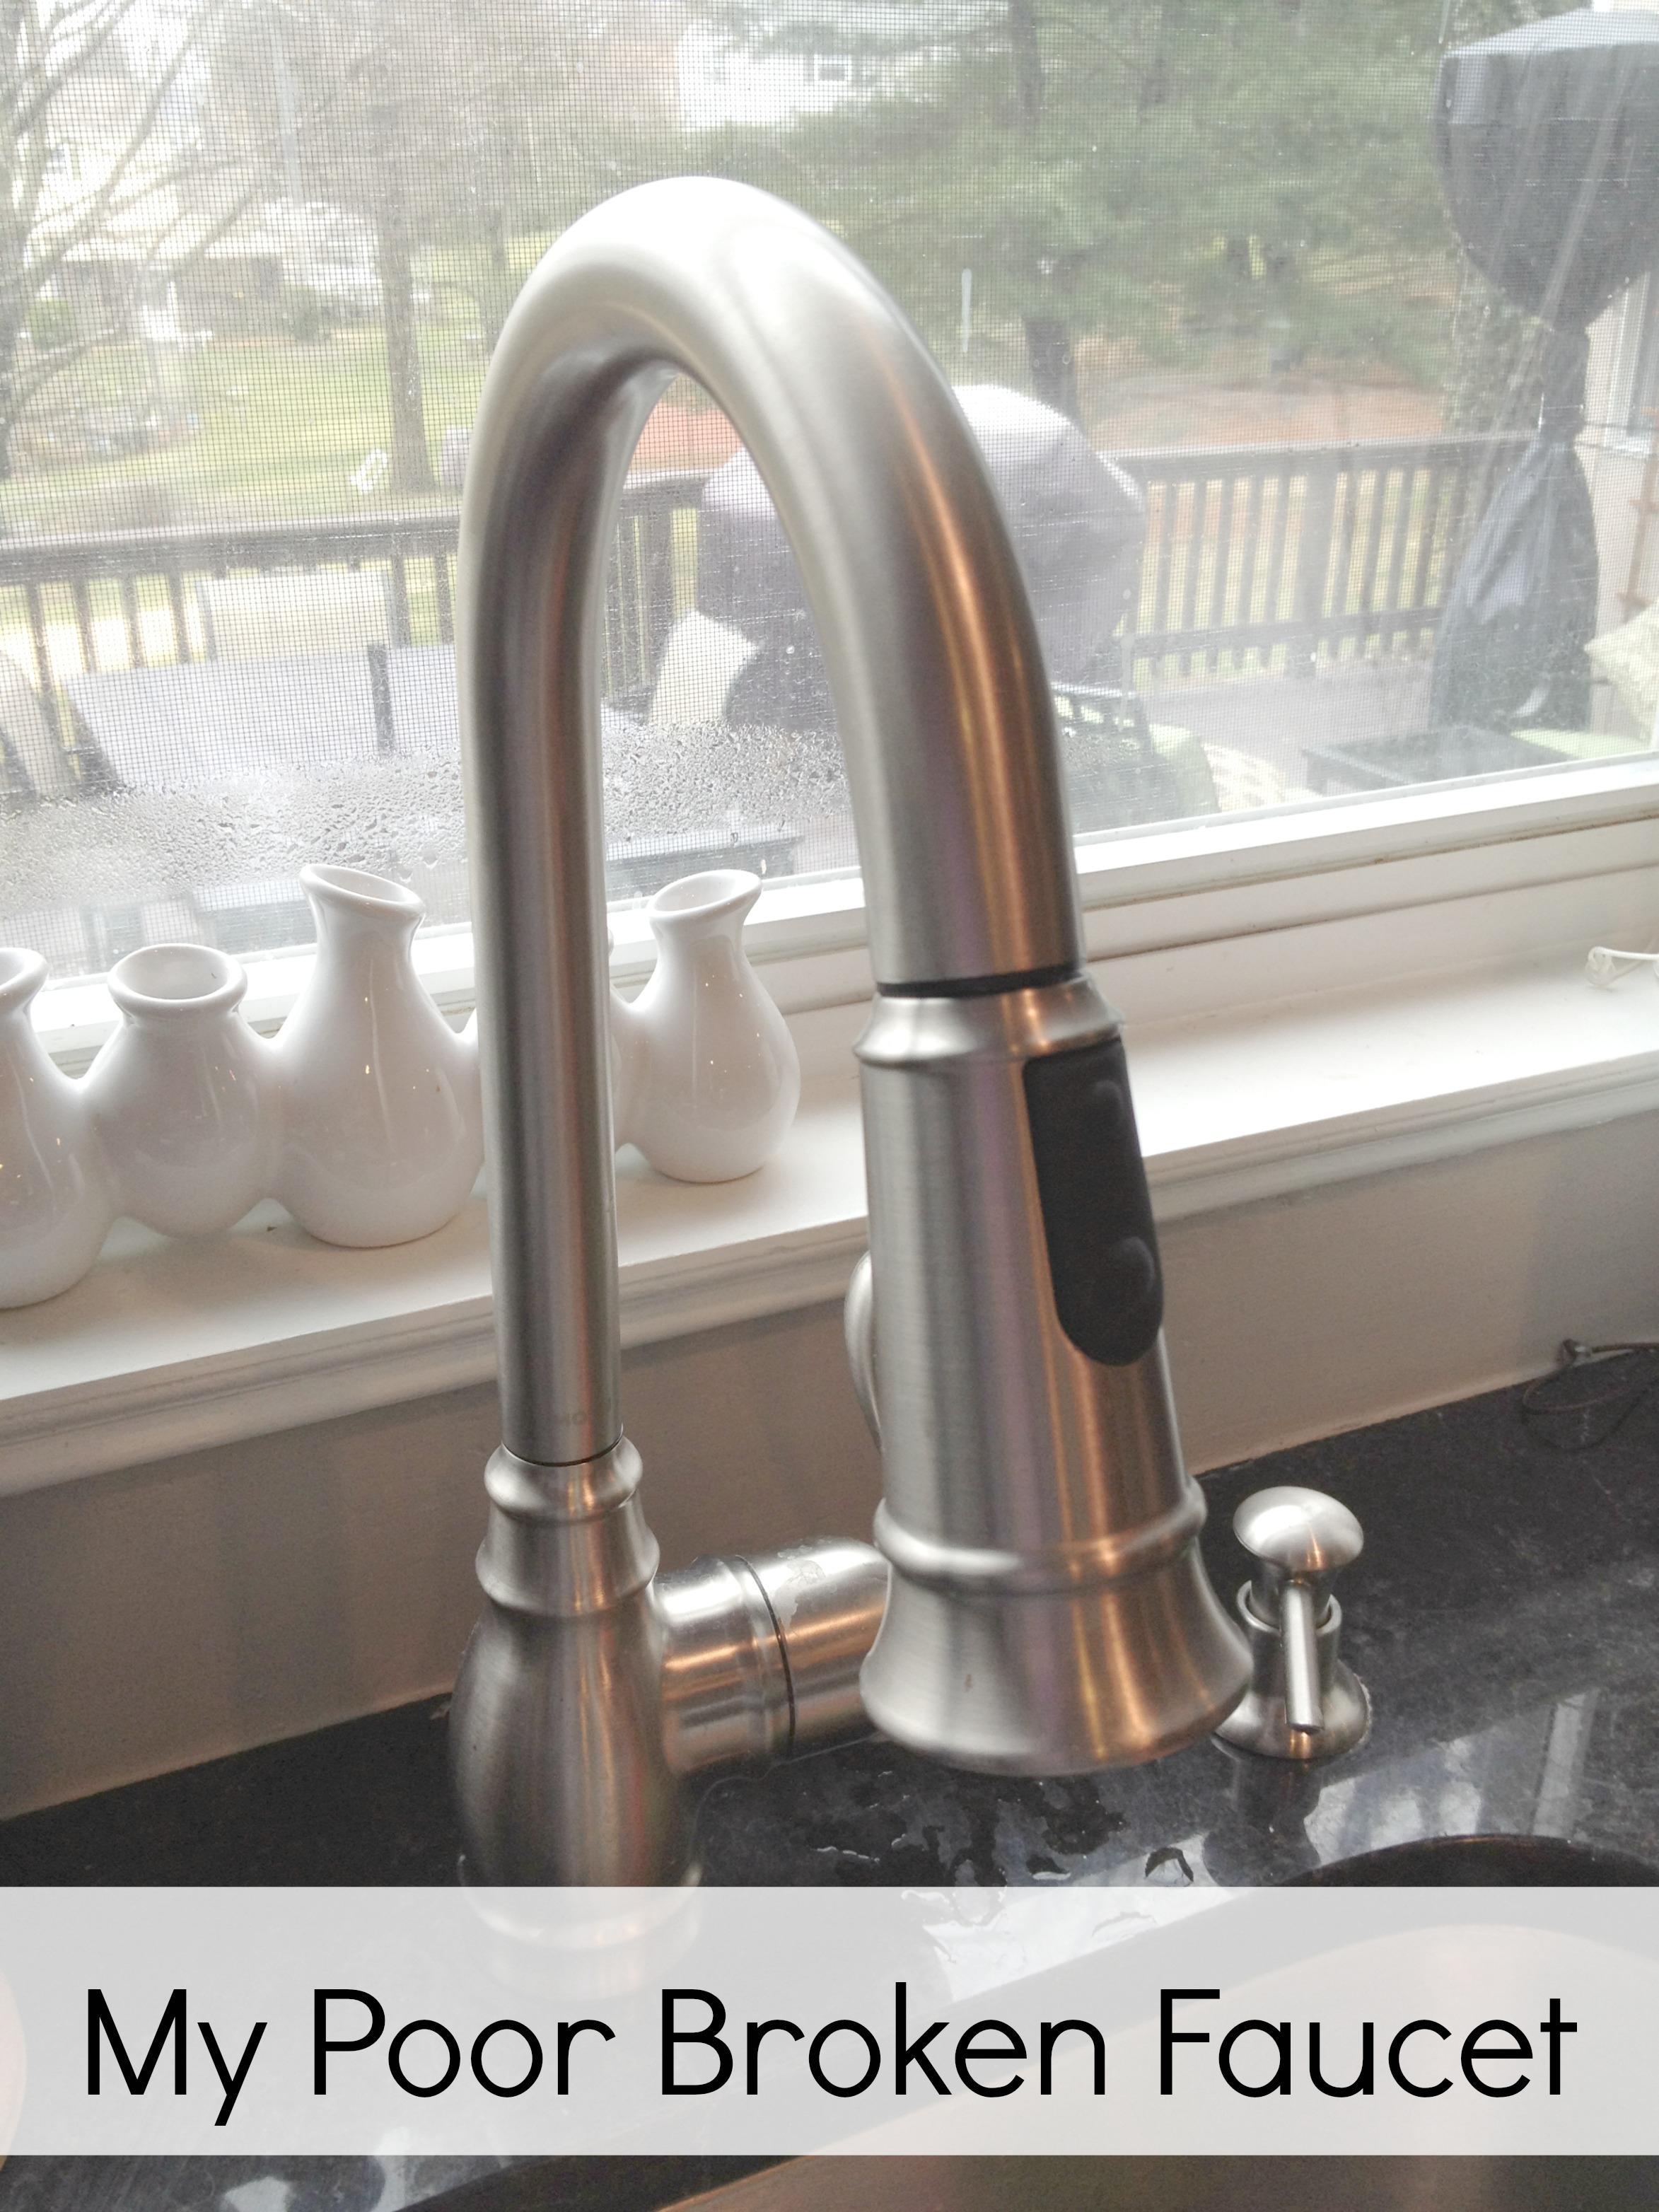 moen annabelle faucet handle loose moen annabelle faucet handle loose fixing a faucet macgyver style making lemonade 2346 x 3128